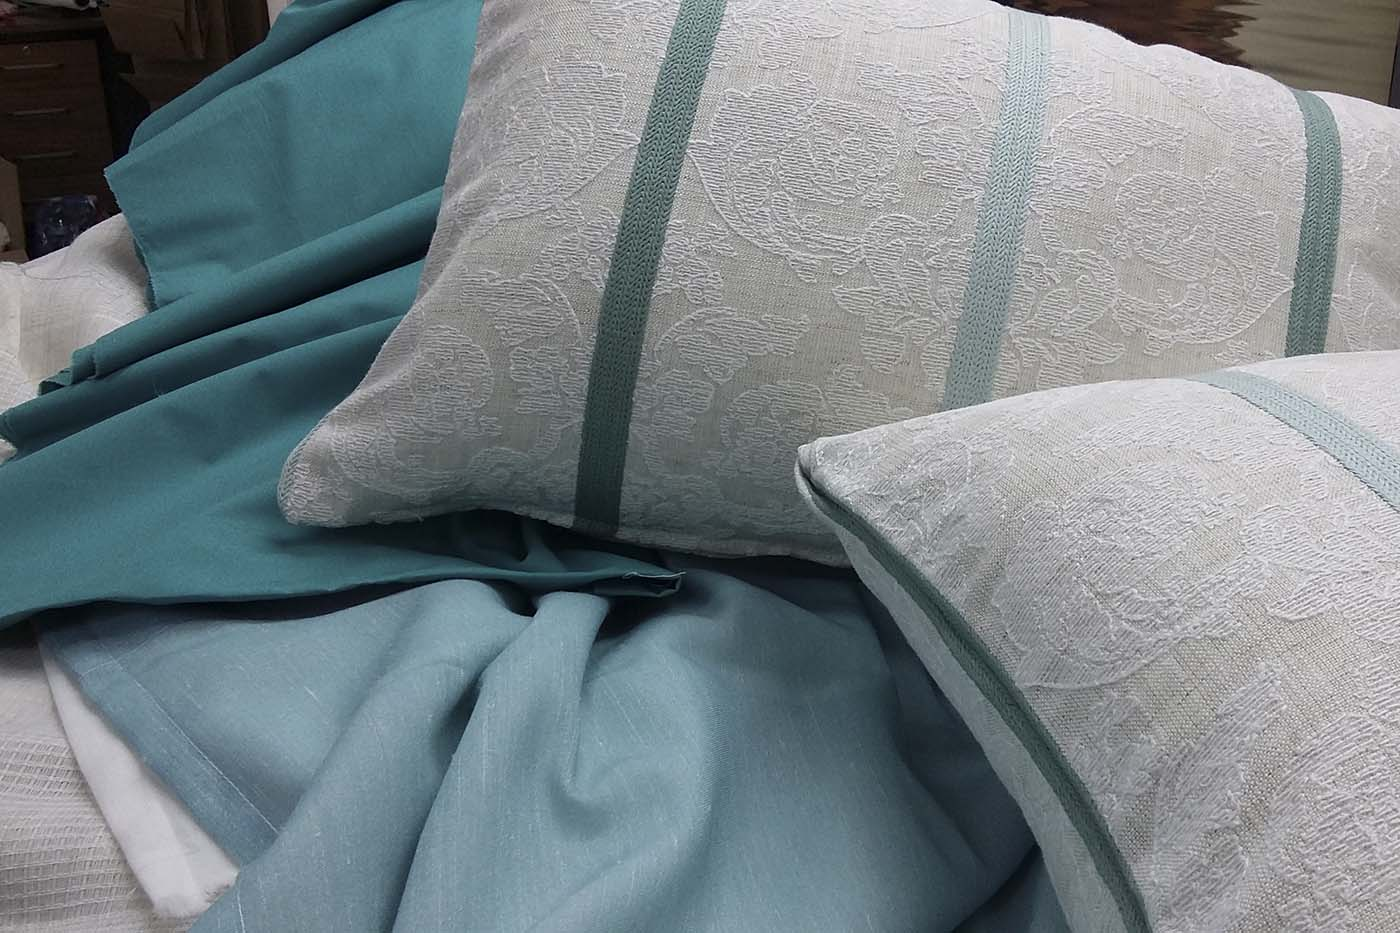 Coixins blancs i blaus sobre manta blava